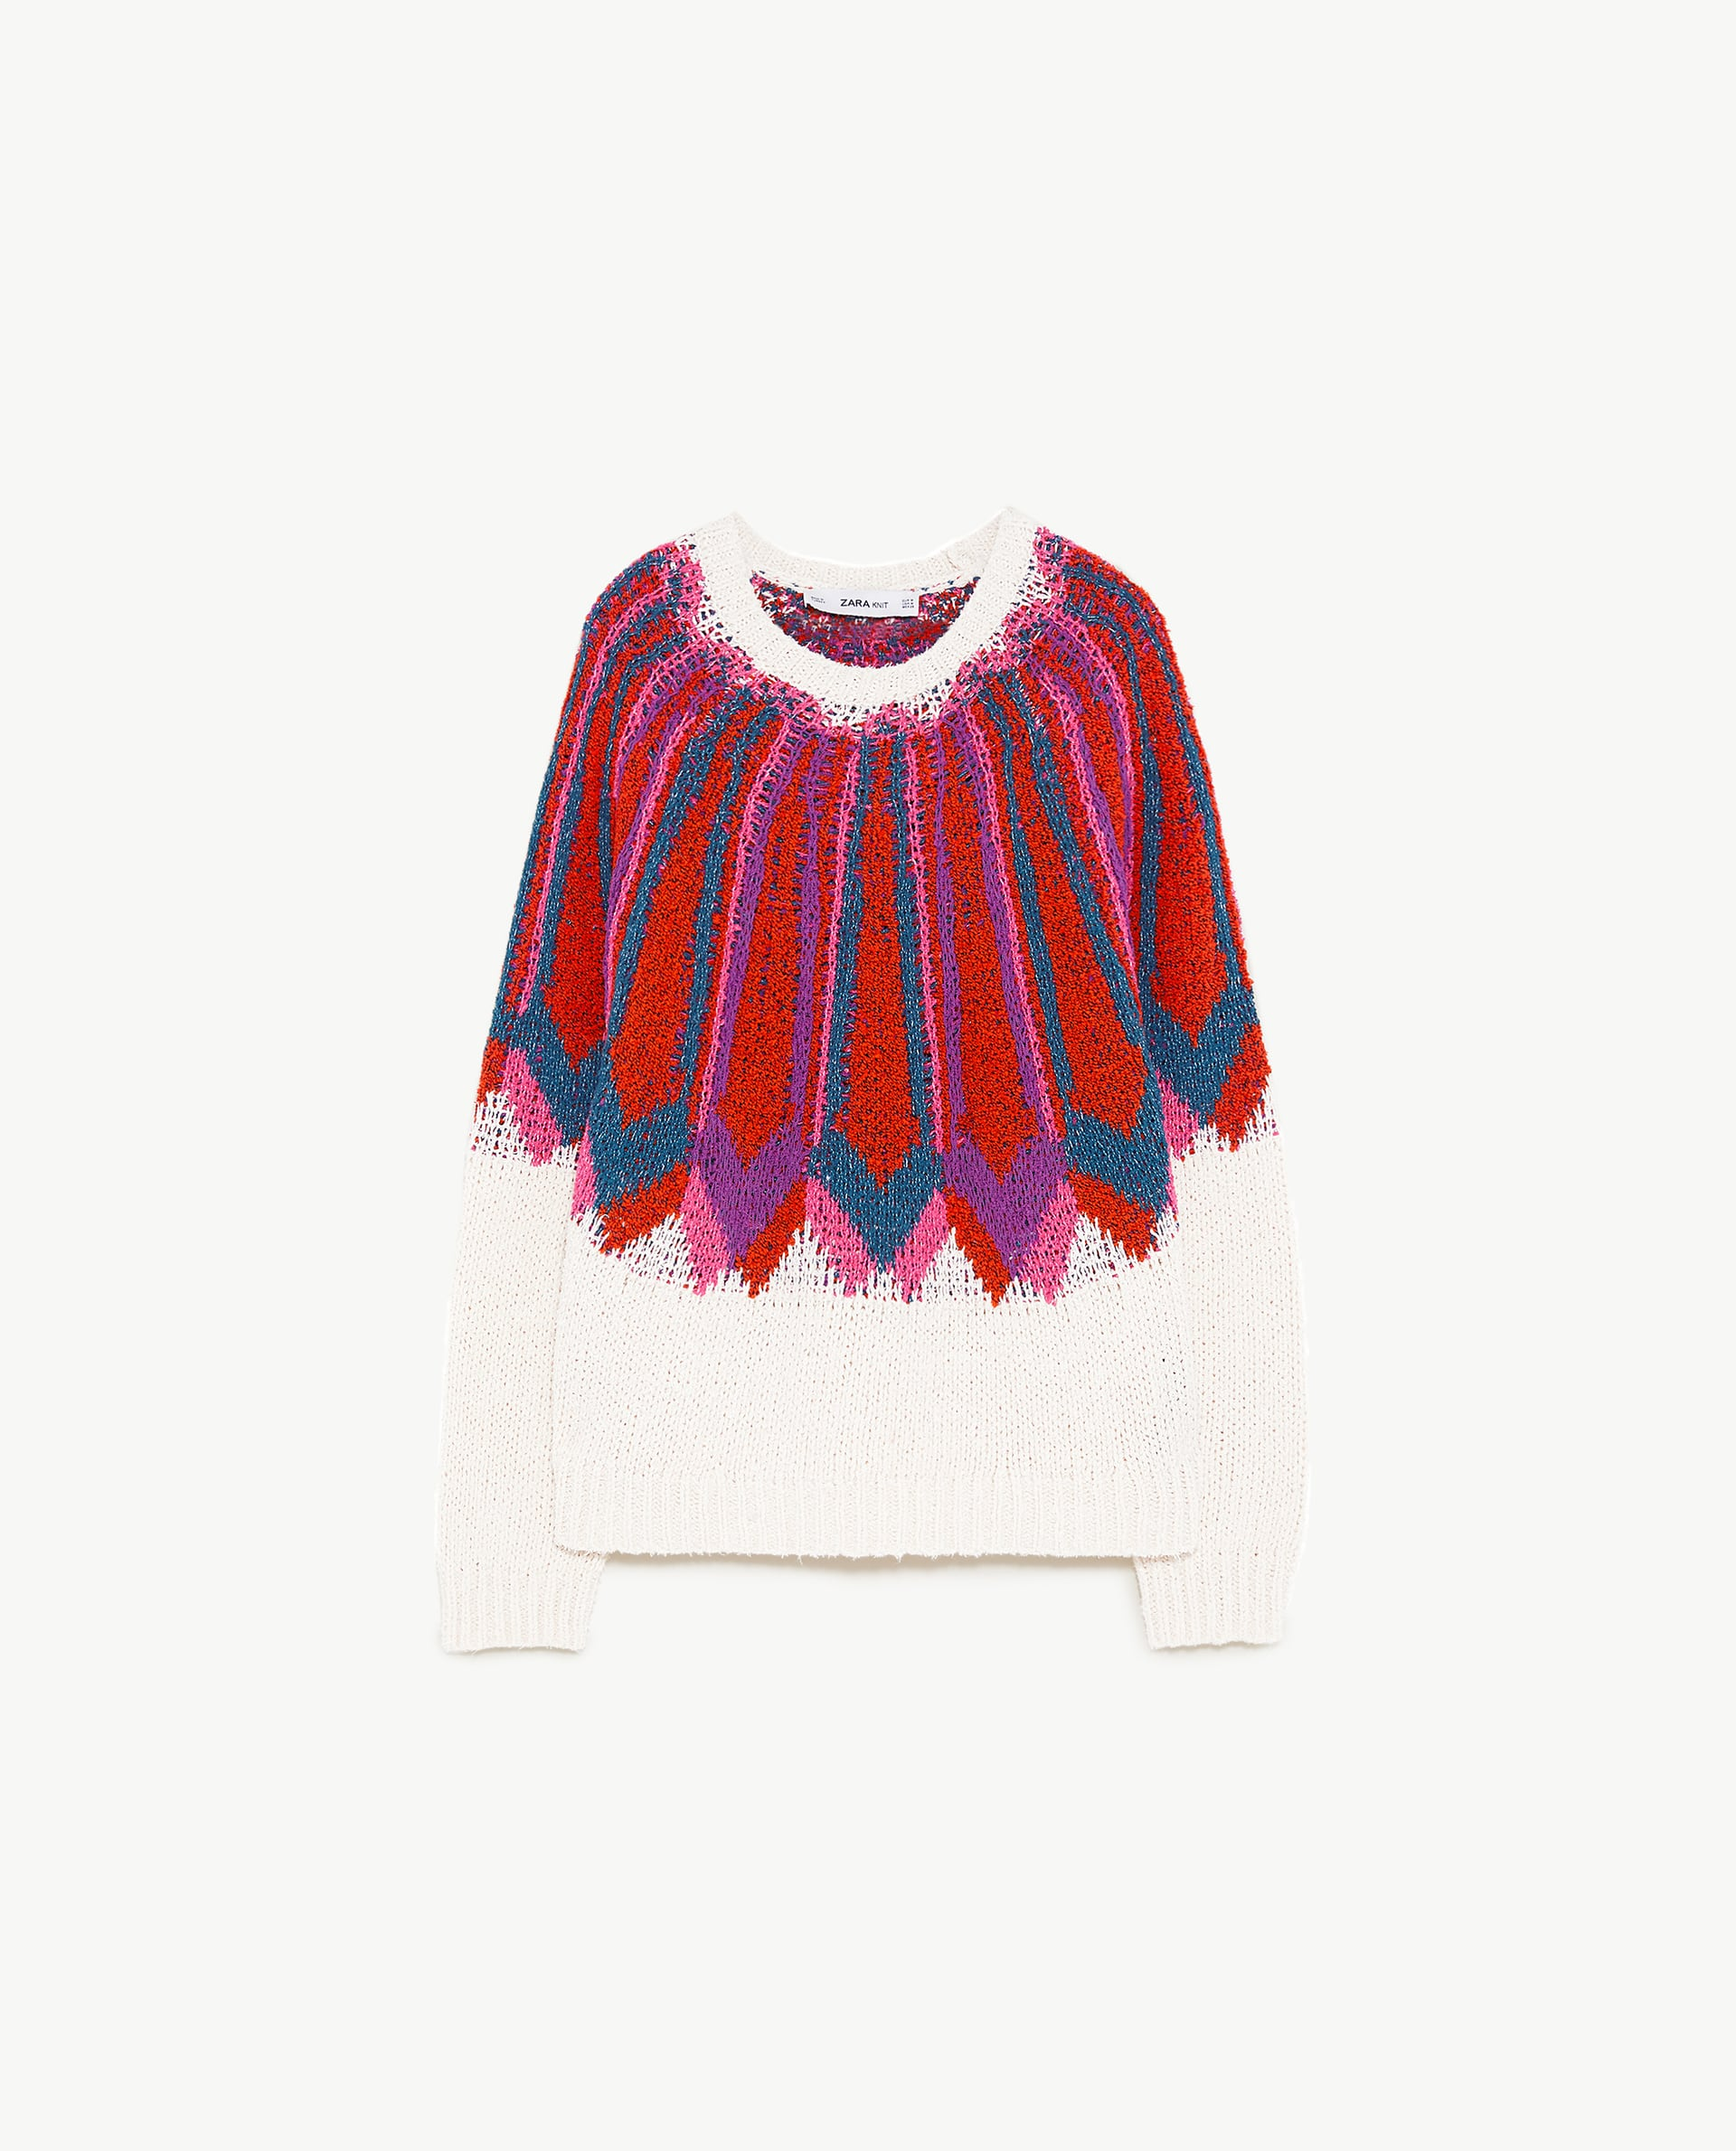 #PopbelaOOTD: Tampil Playful dengan Sweater Musim Panas